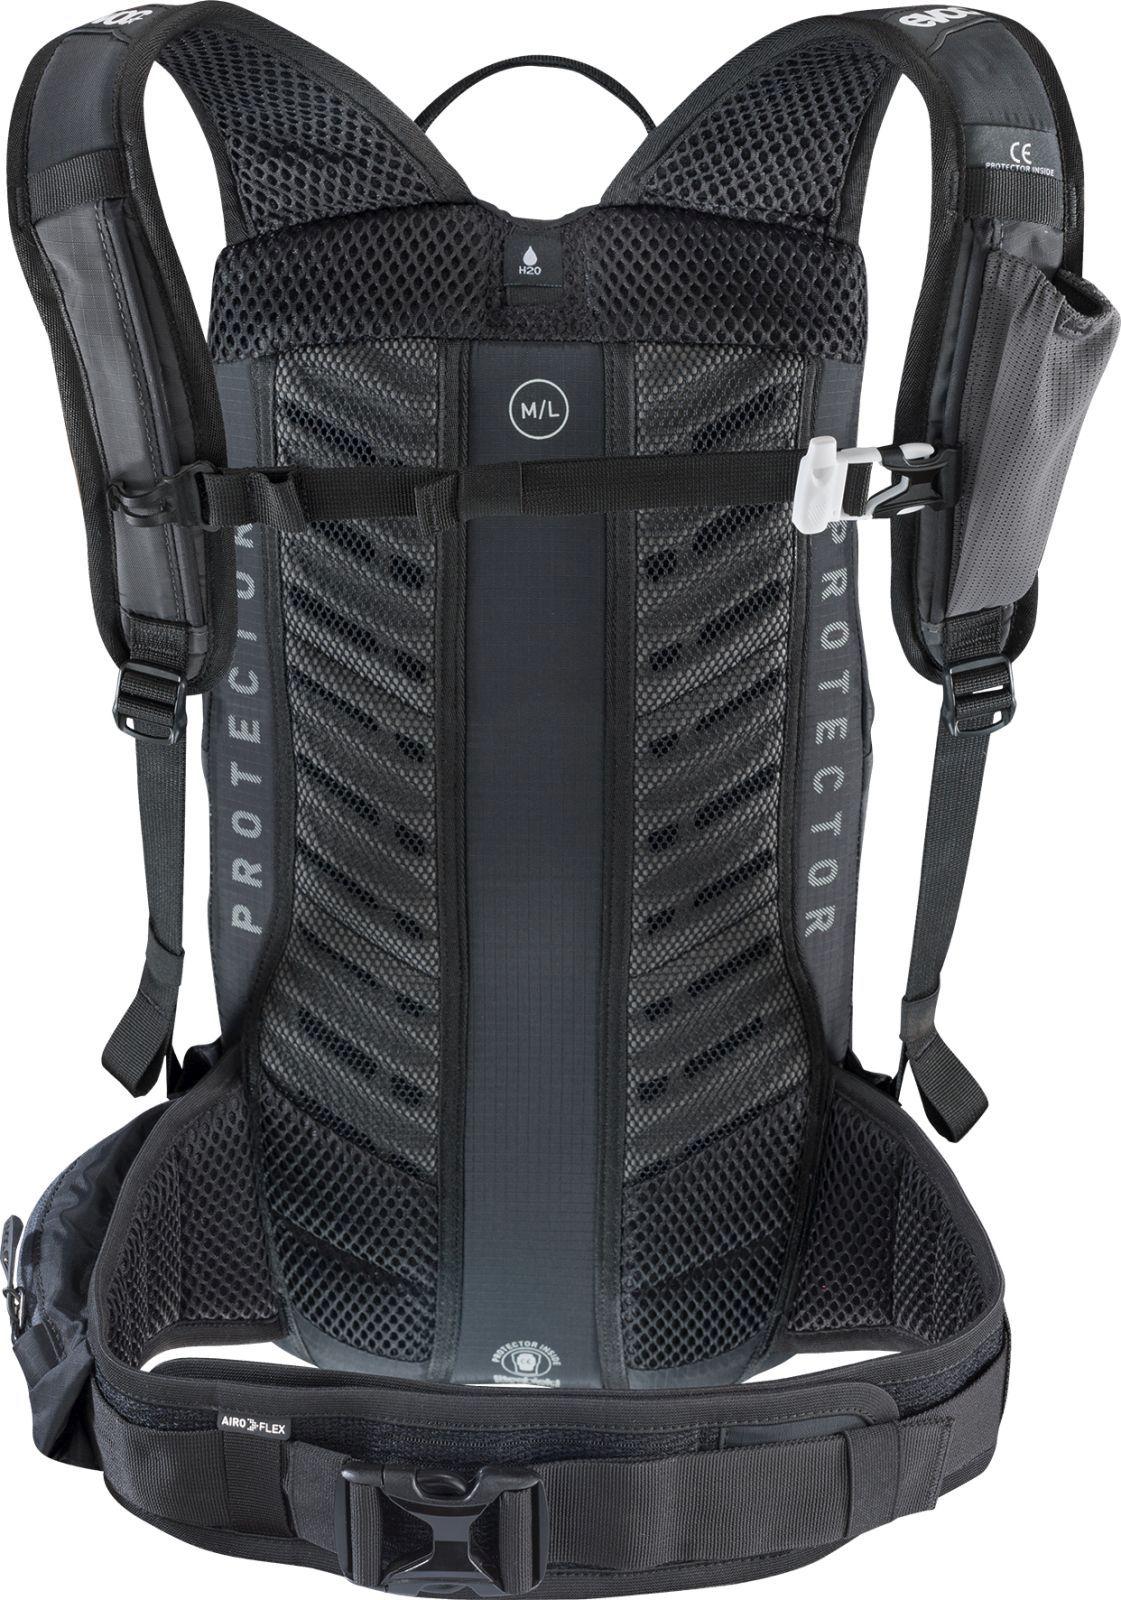 5a1a1e99e8 Cyklistický batoh s chráničem páteře Evoc FR Lite Race 10L - carbon grey  orange ...